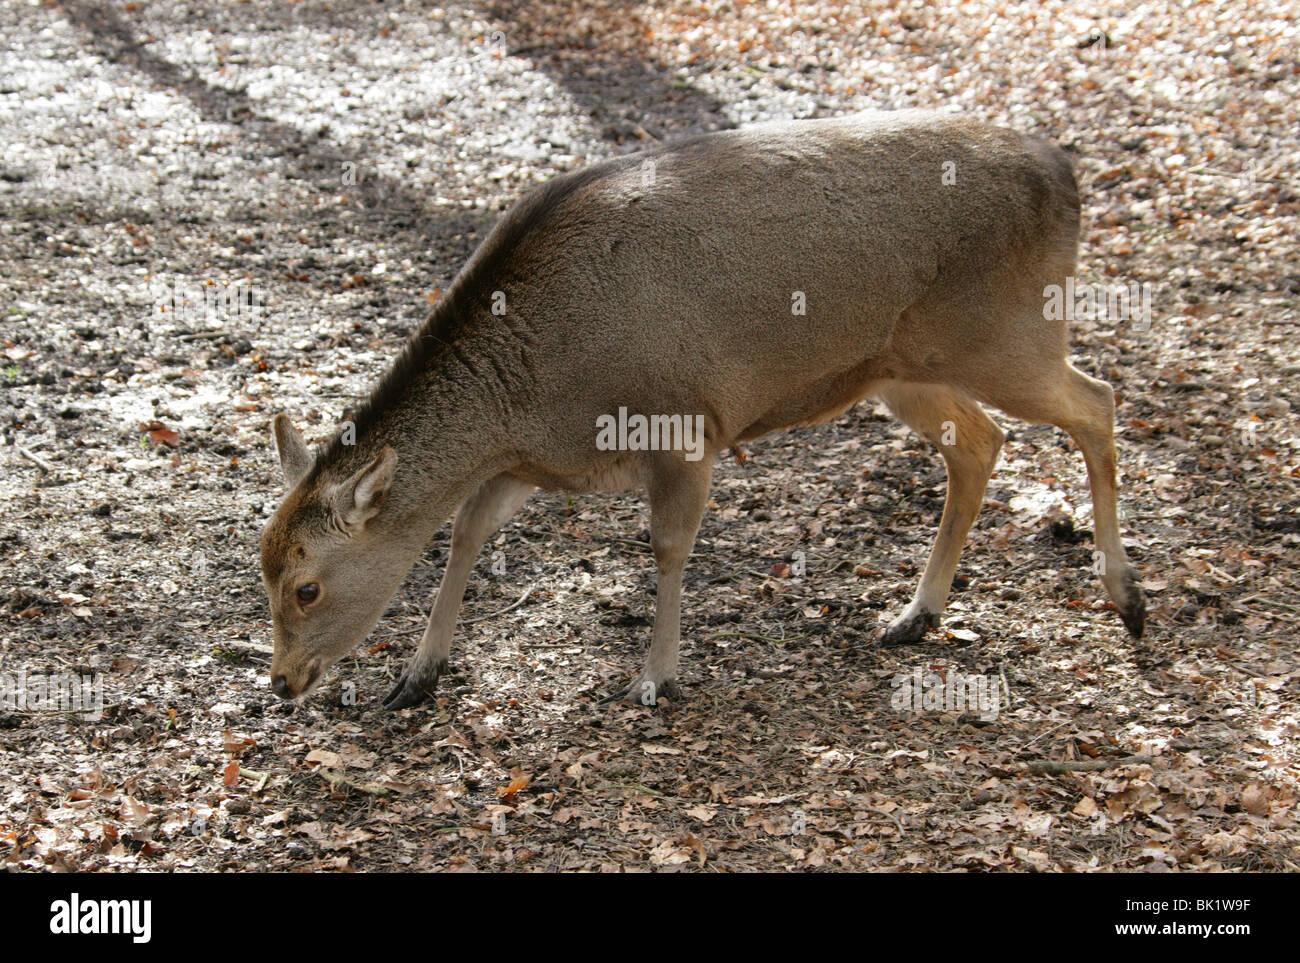 Cervi Sika, Cervus nippon nippon, Cervidae. Femmina femmina del cervo. Immagini Stock